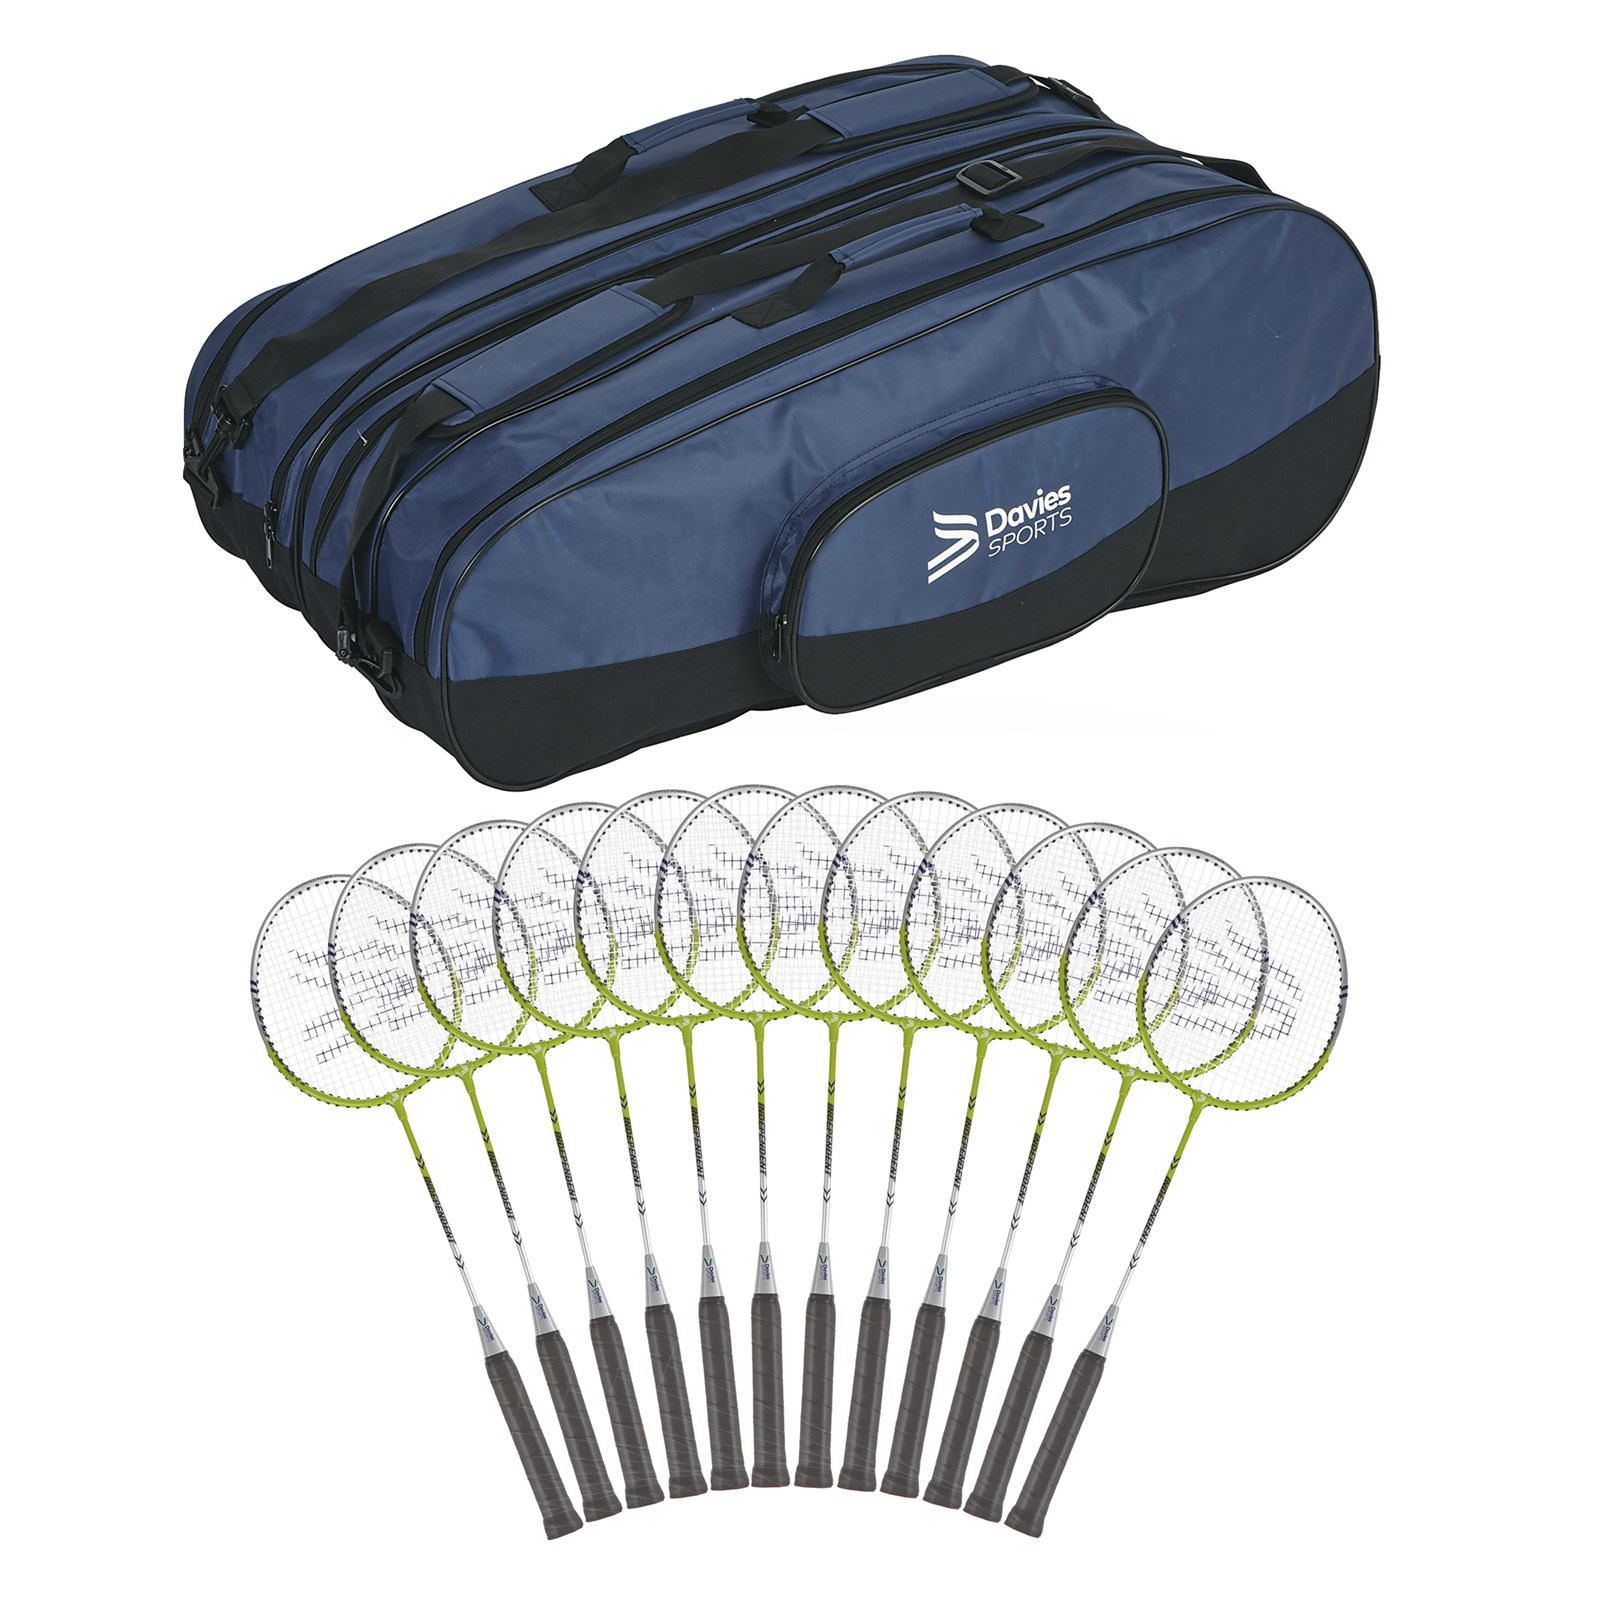 Davies Sports Pegasus Racquet - Pack of 12